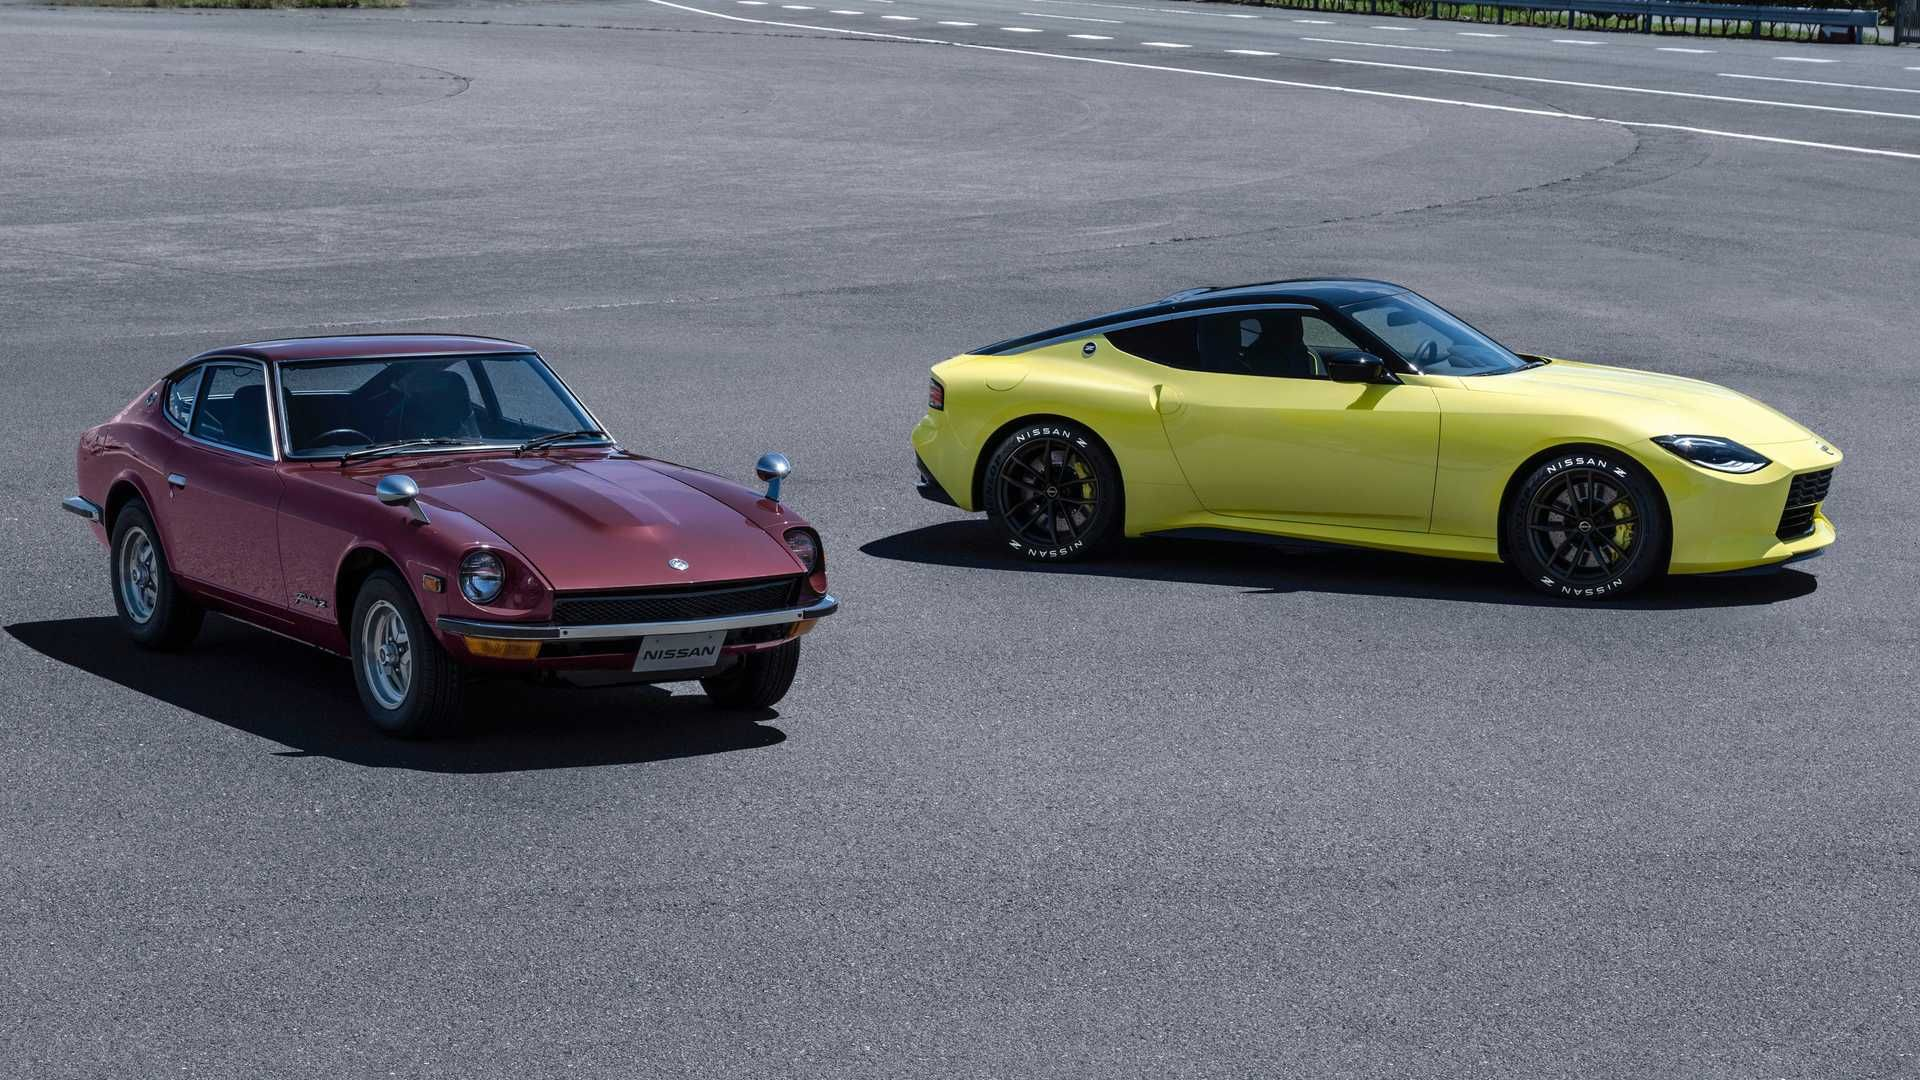 2022 Nissan 400z Nissan Z Nissan Z Cars Nissan